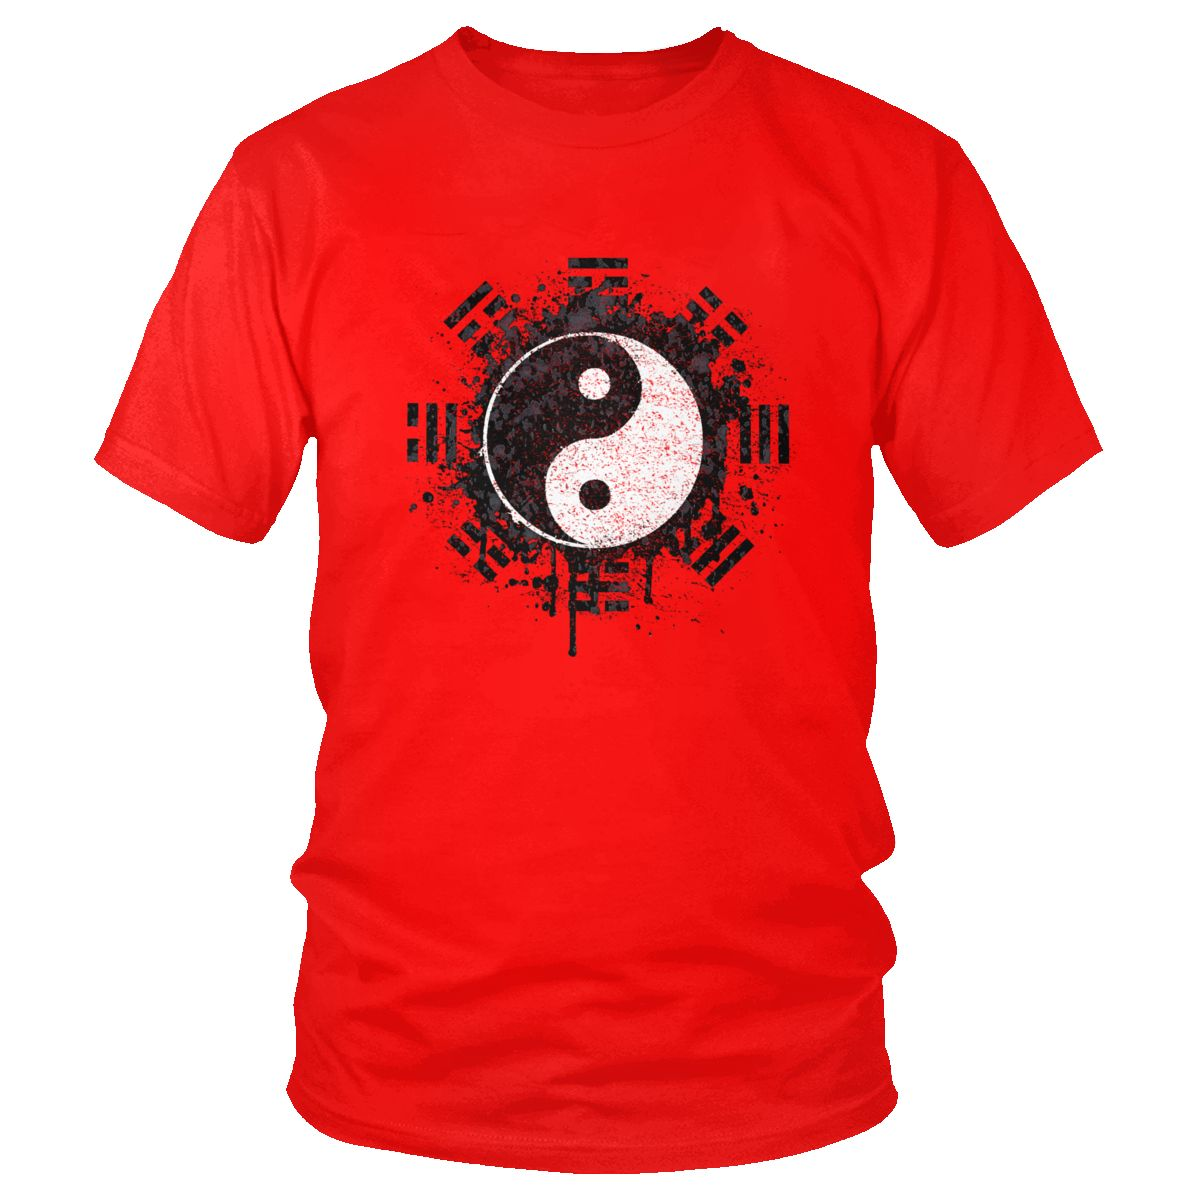 Китай Тай чи чуань футболка крутой дизайн хлопок футболки мужские с коротким рукавом Инь Ян стиль футболка китайский кунг фу Taiji Quan Tee